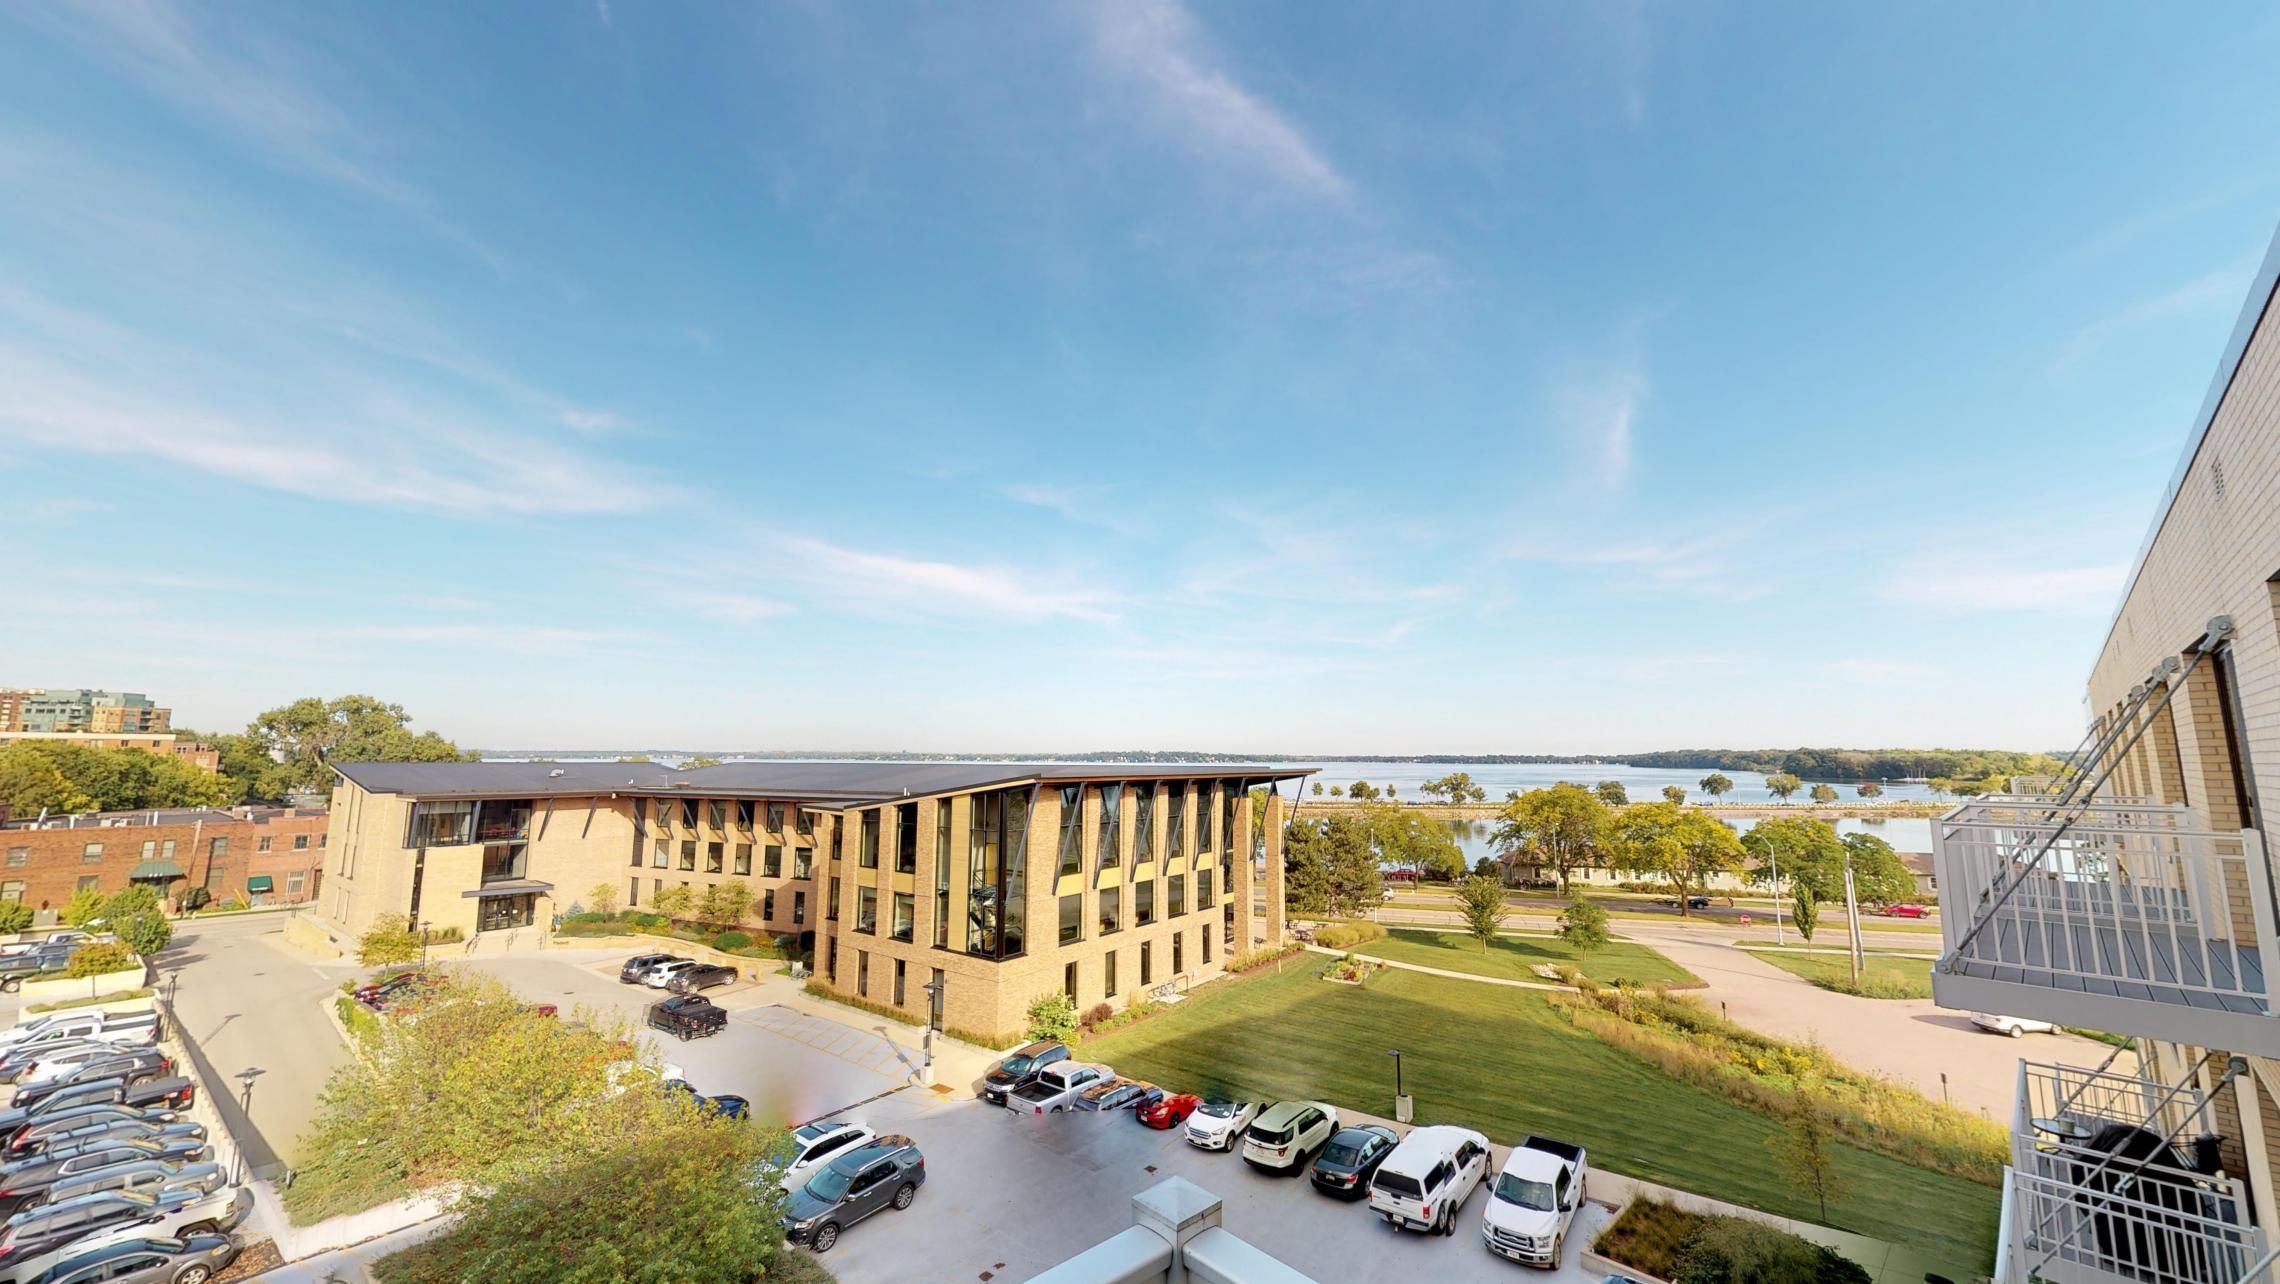 Nine-Line-Apartment-517-balcony-view-modern-downtown-lake-monona-upscale-outdoors-capitol-madison.jpg